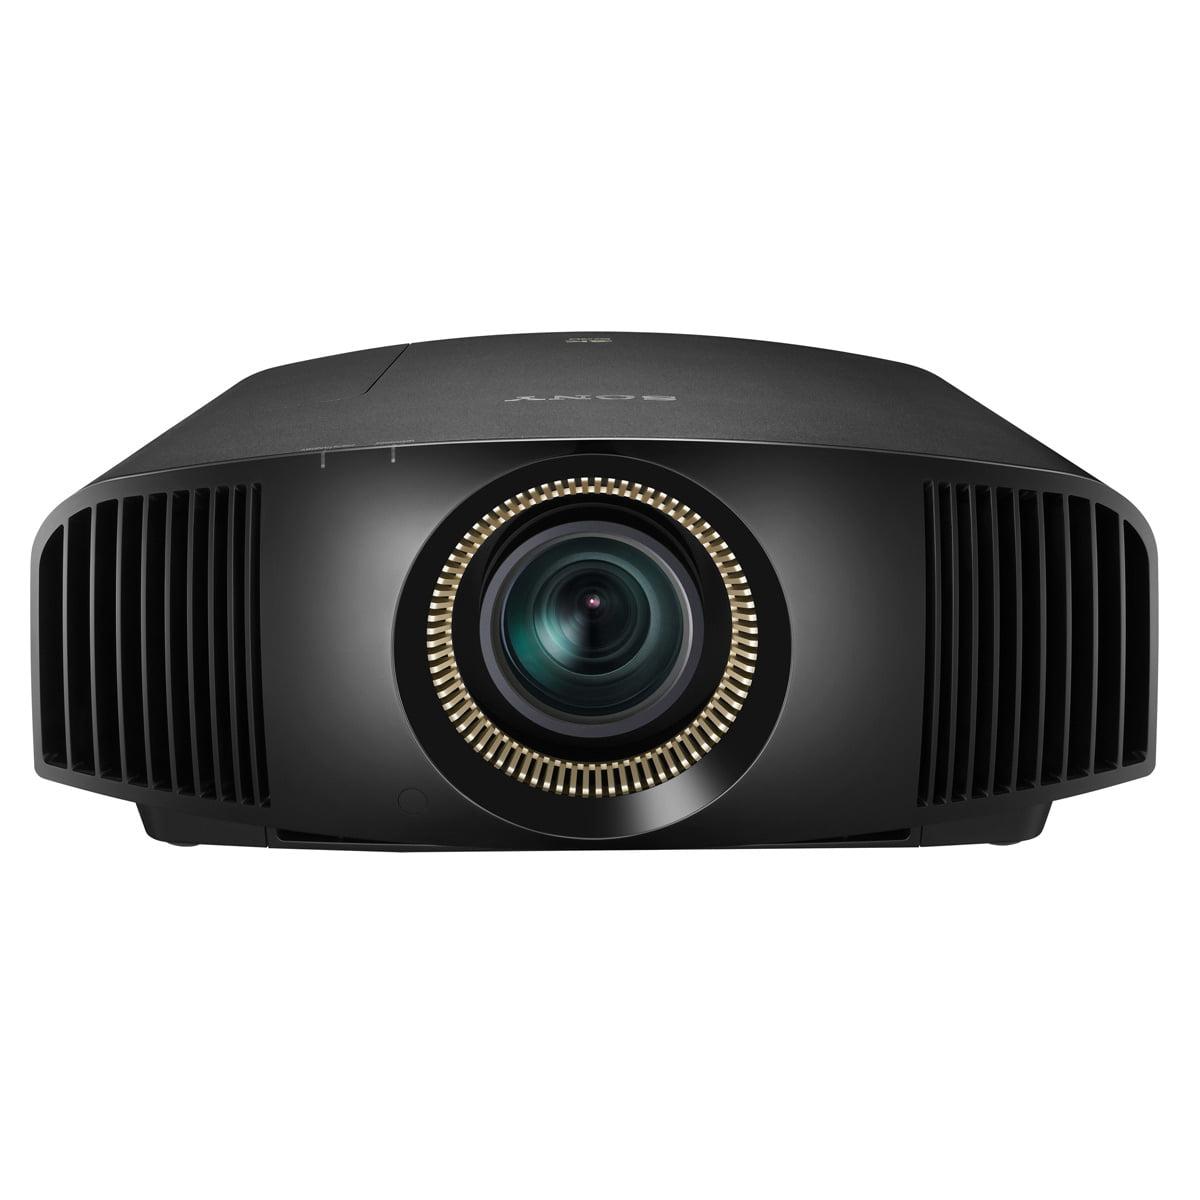 Sony VPL-VW385ES  4K UHD SXRD Projector